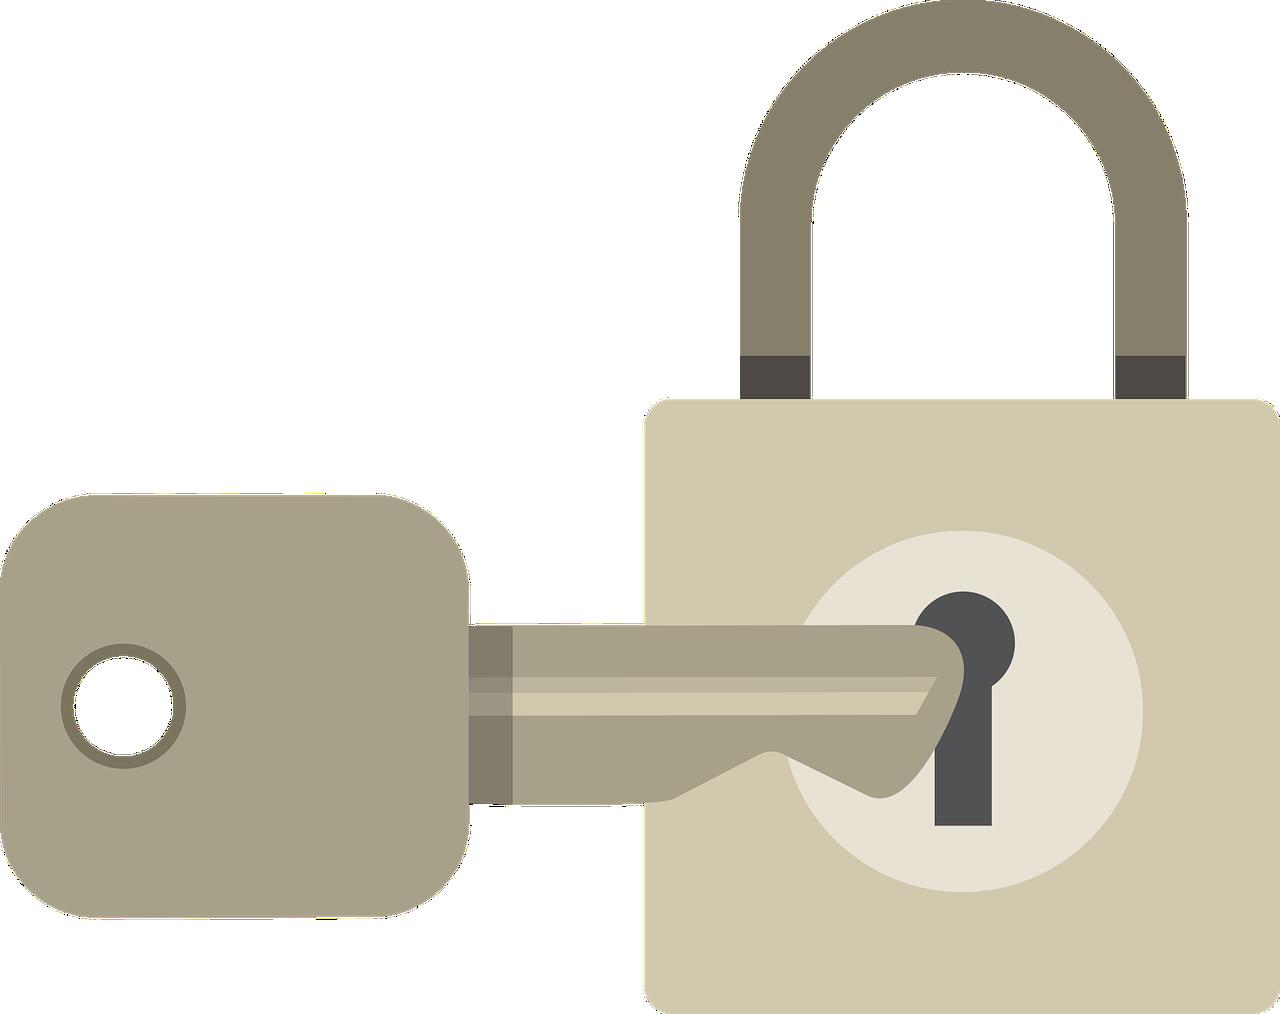 Image of a padlock - New Generation Development